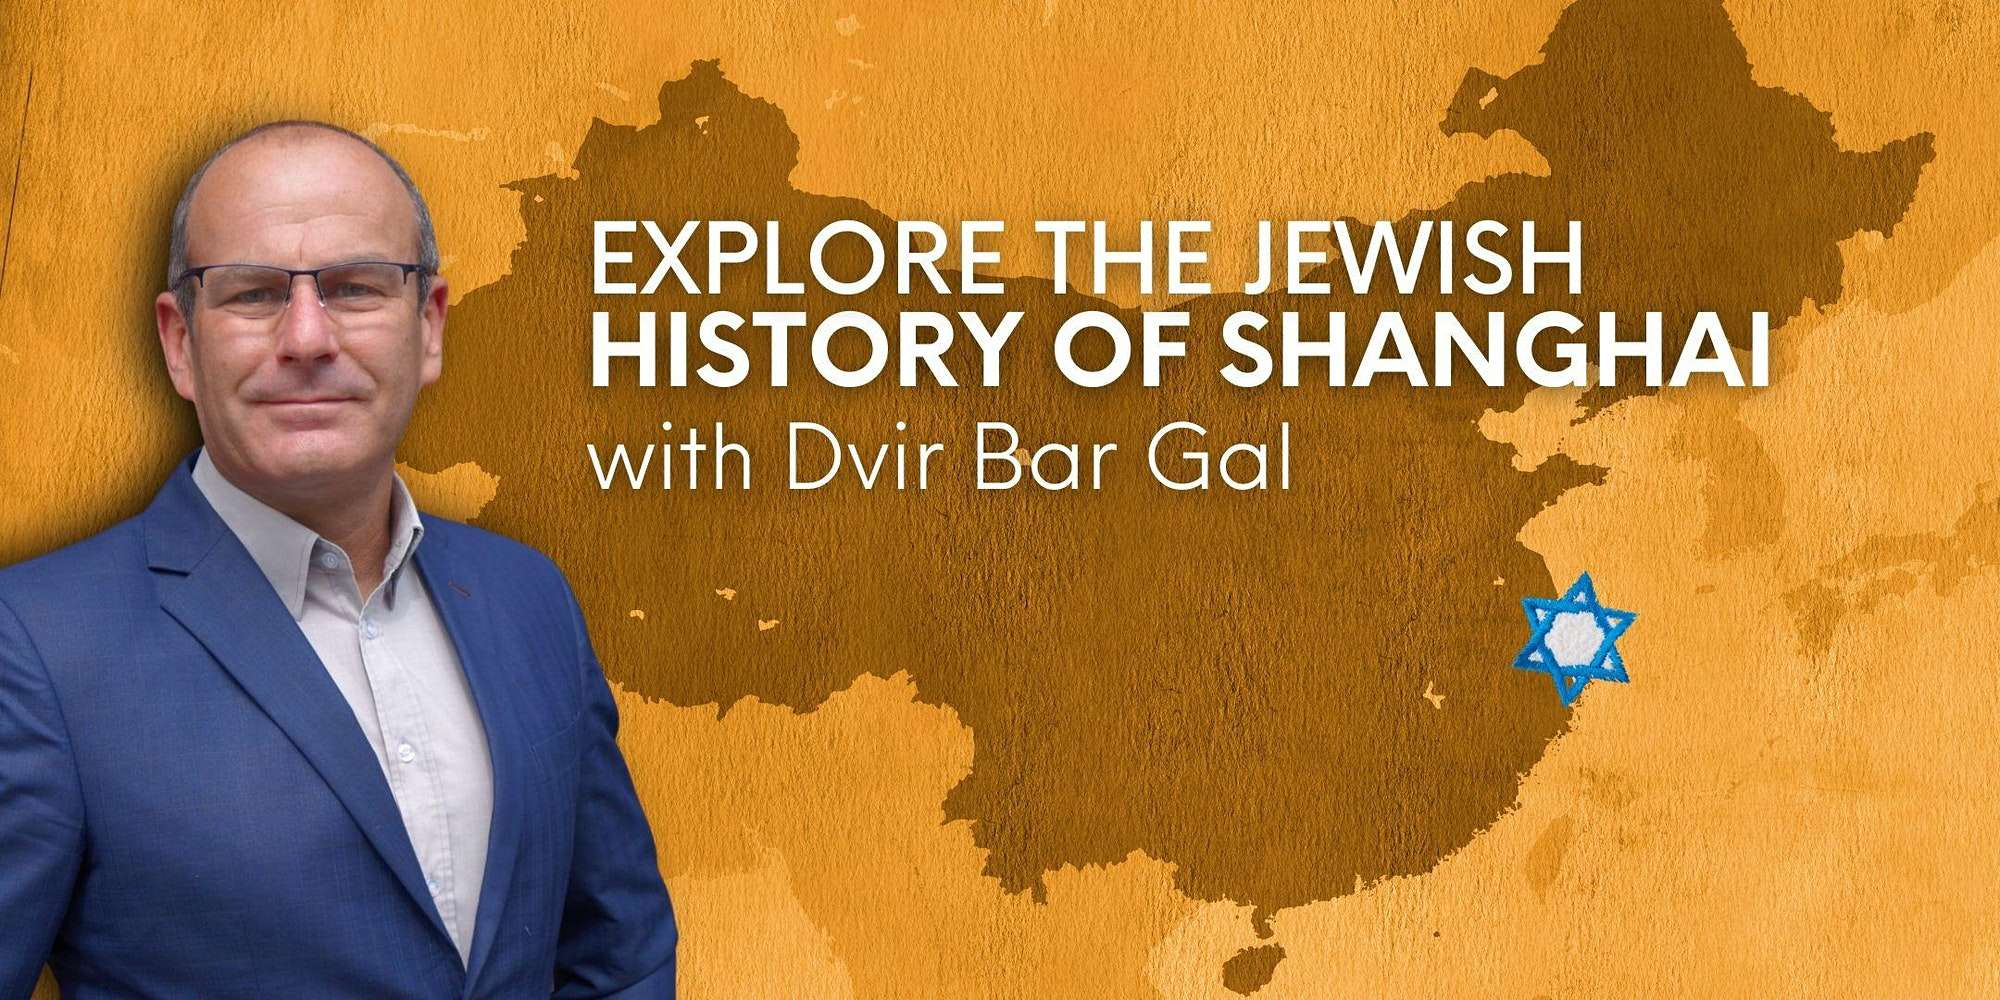 Explore the Jewish History of Shanghai